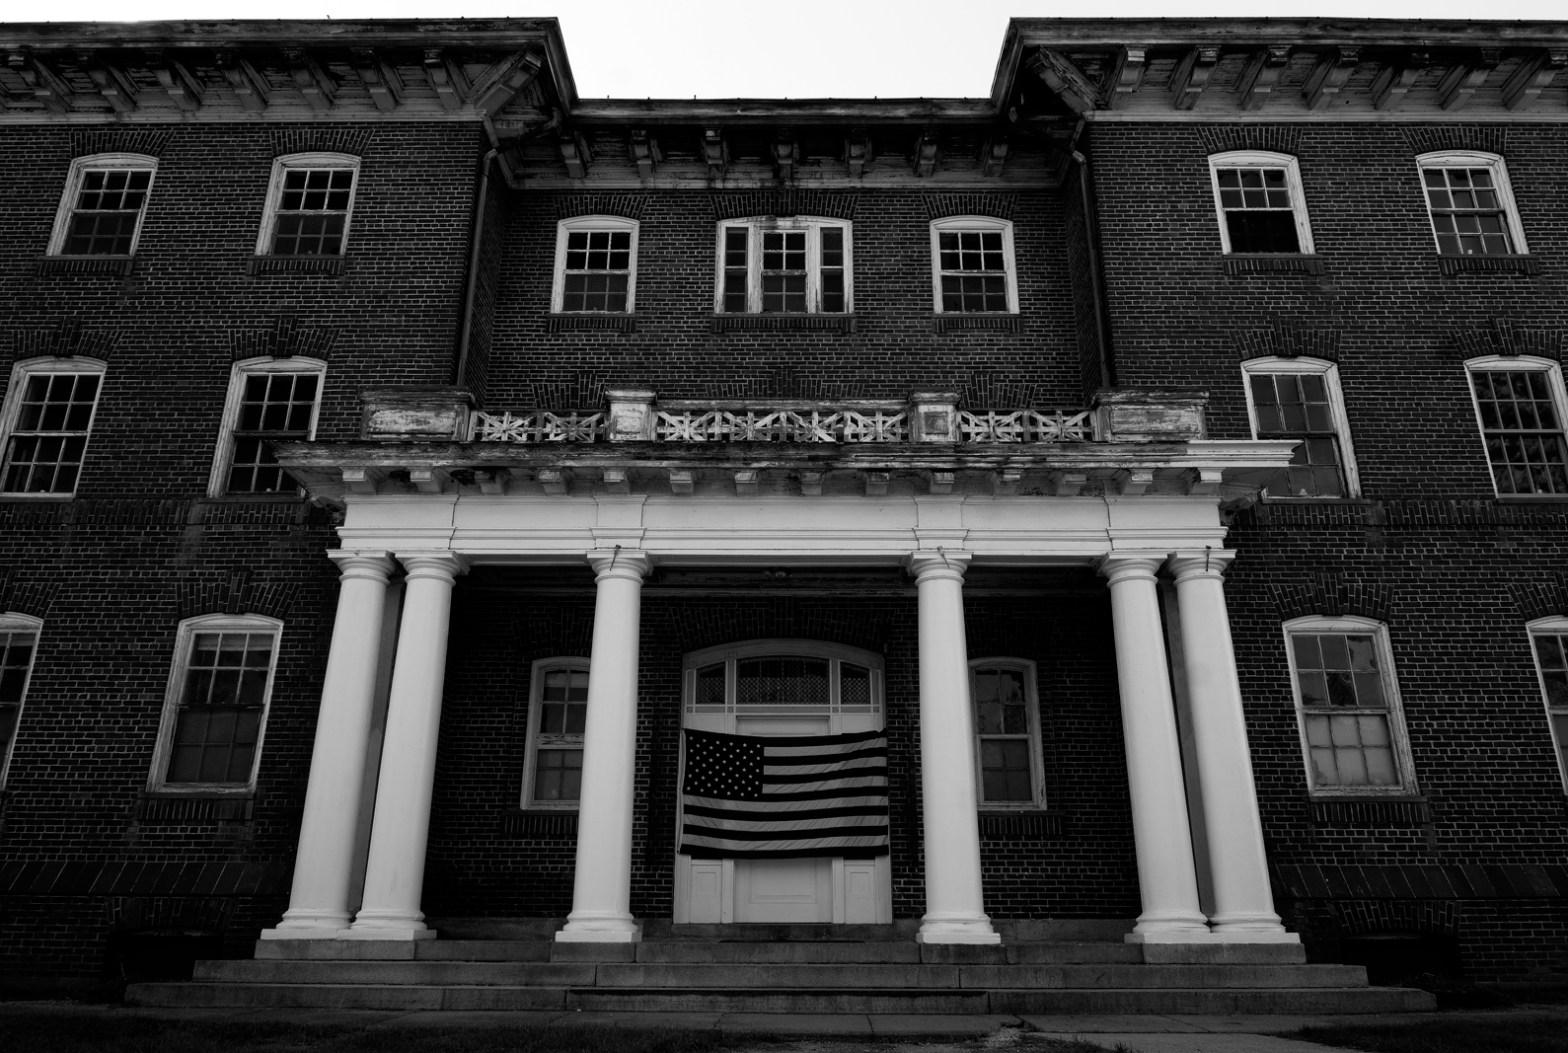 Medfield State Hospital. Medfield, MA